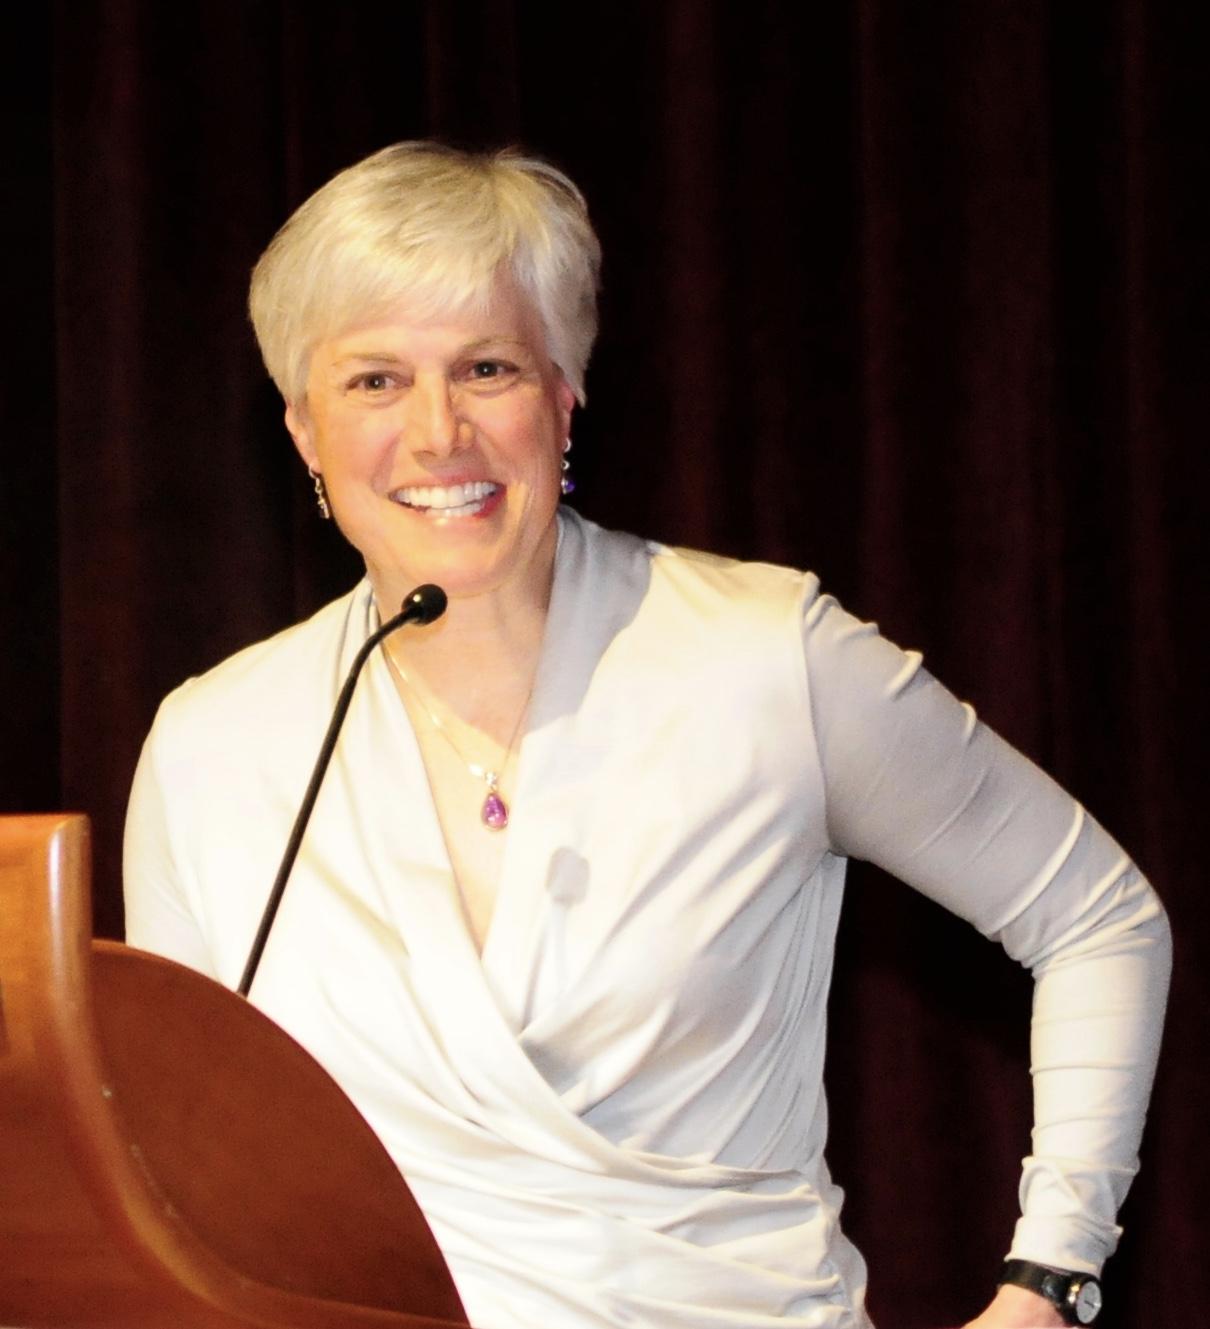 Dr. Melissa Stiles